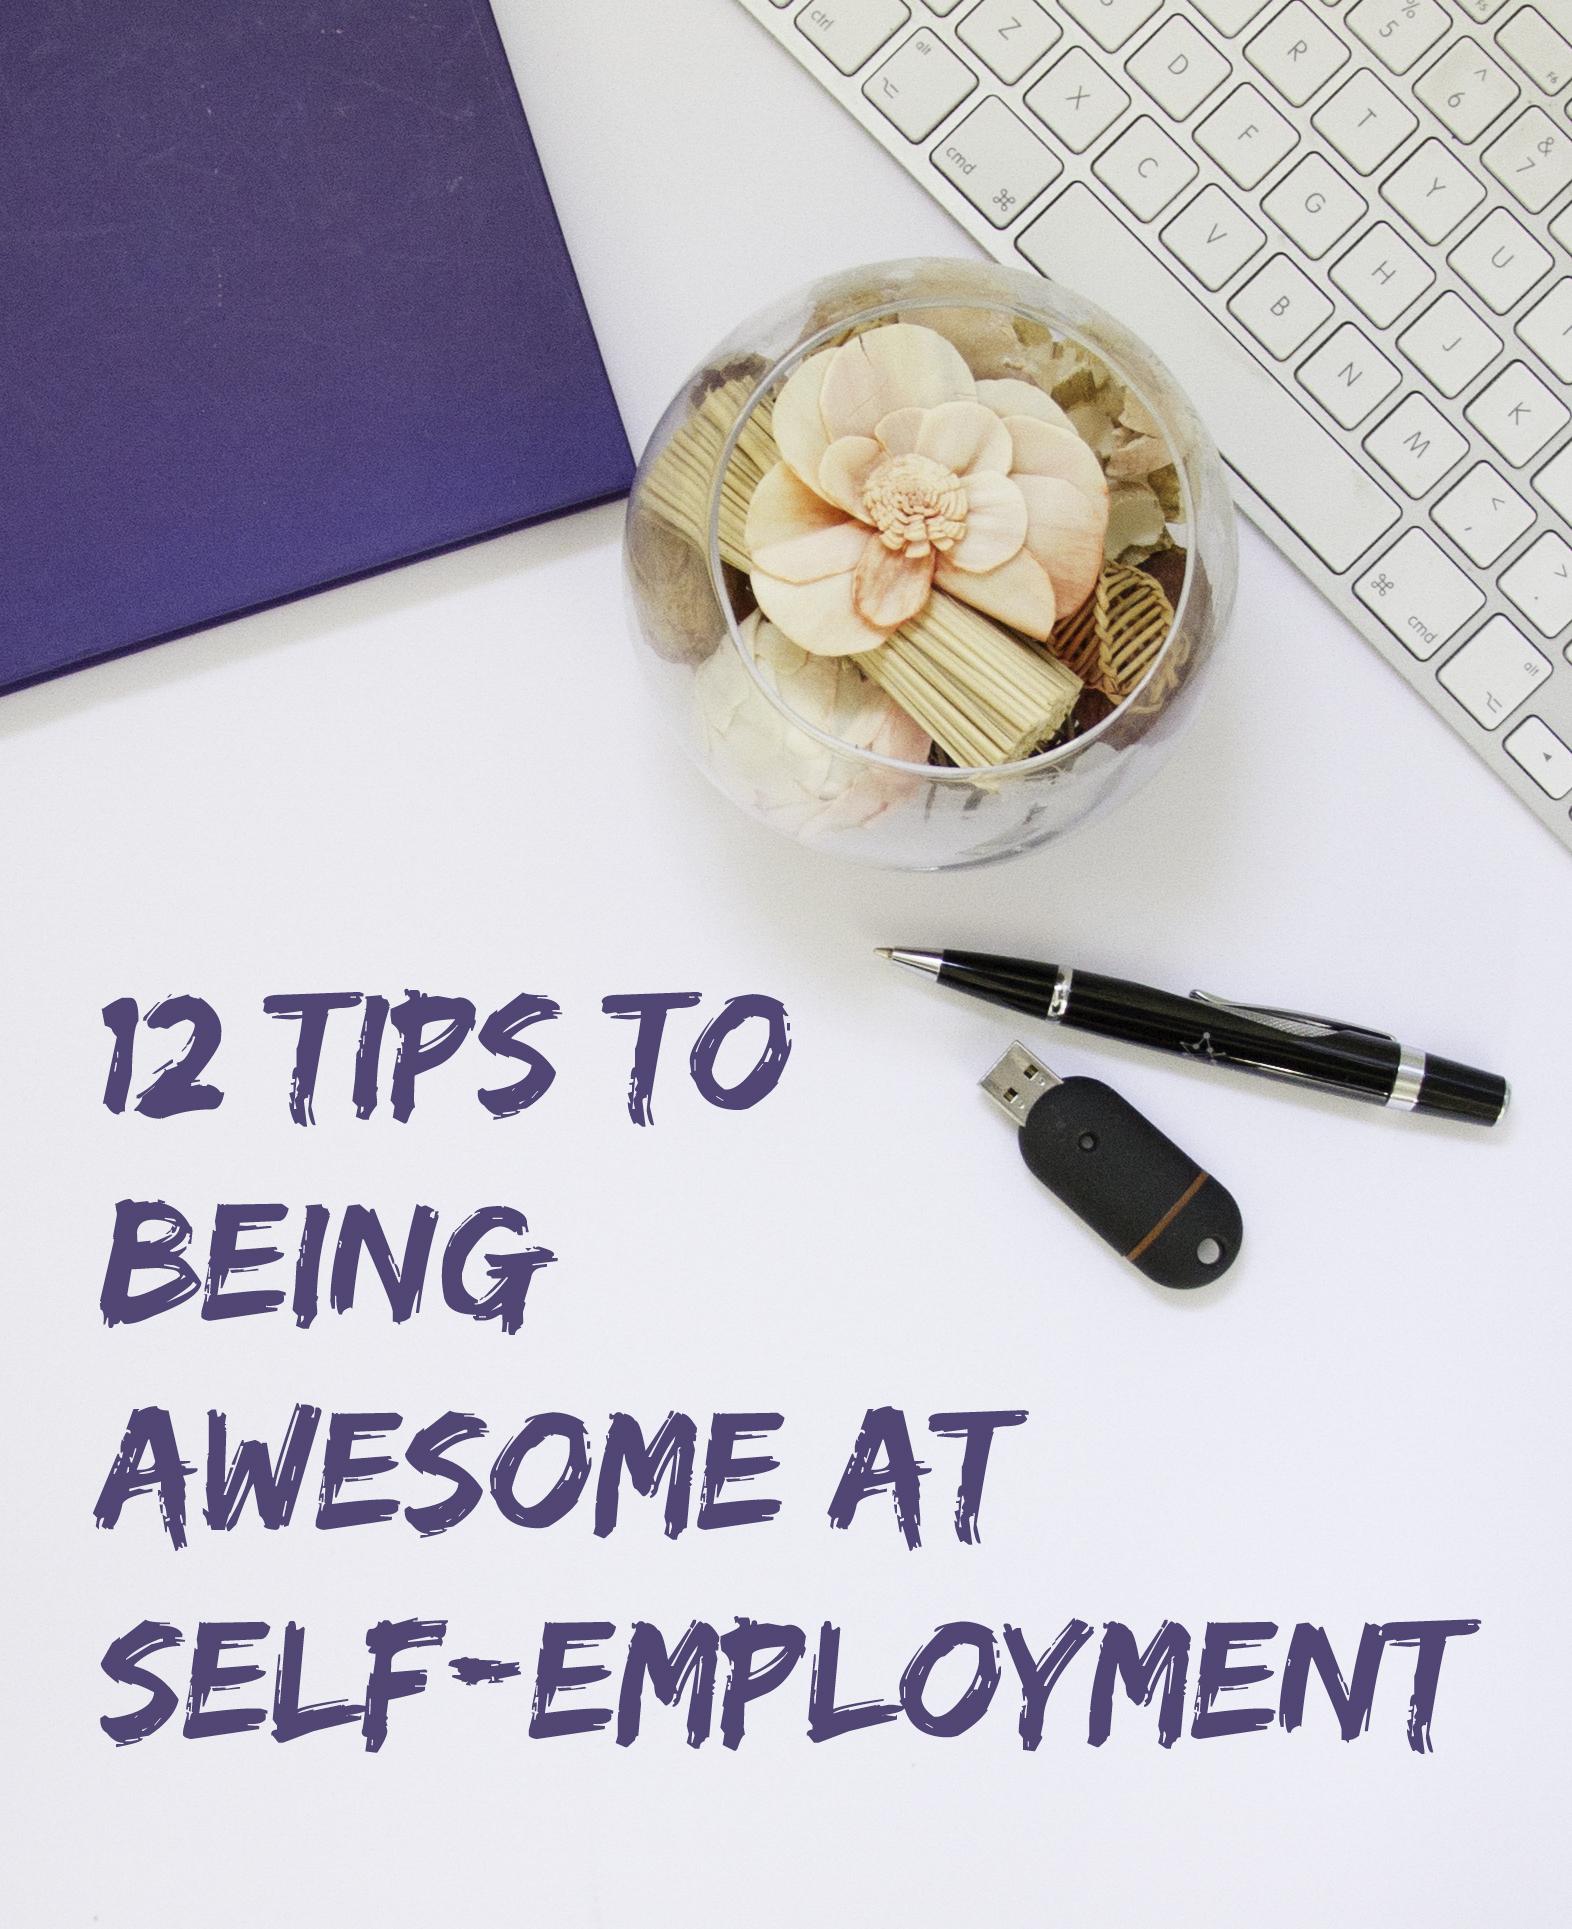 selfemploymenttips